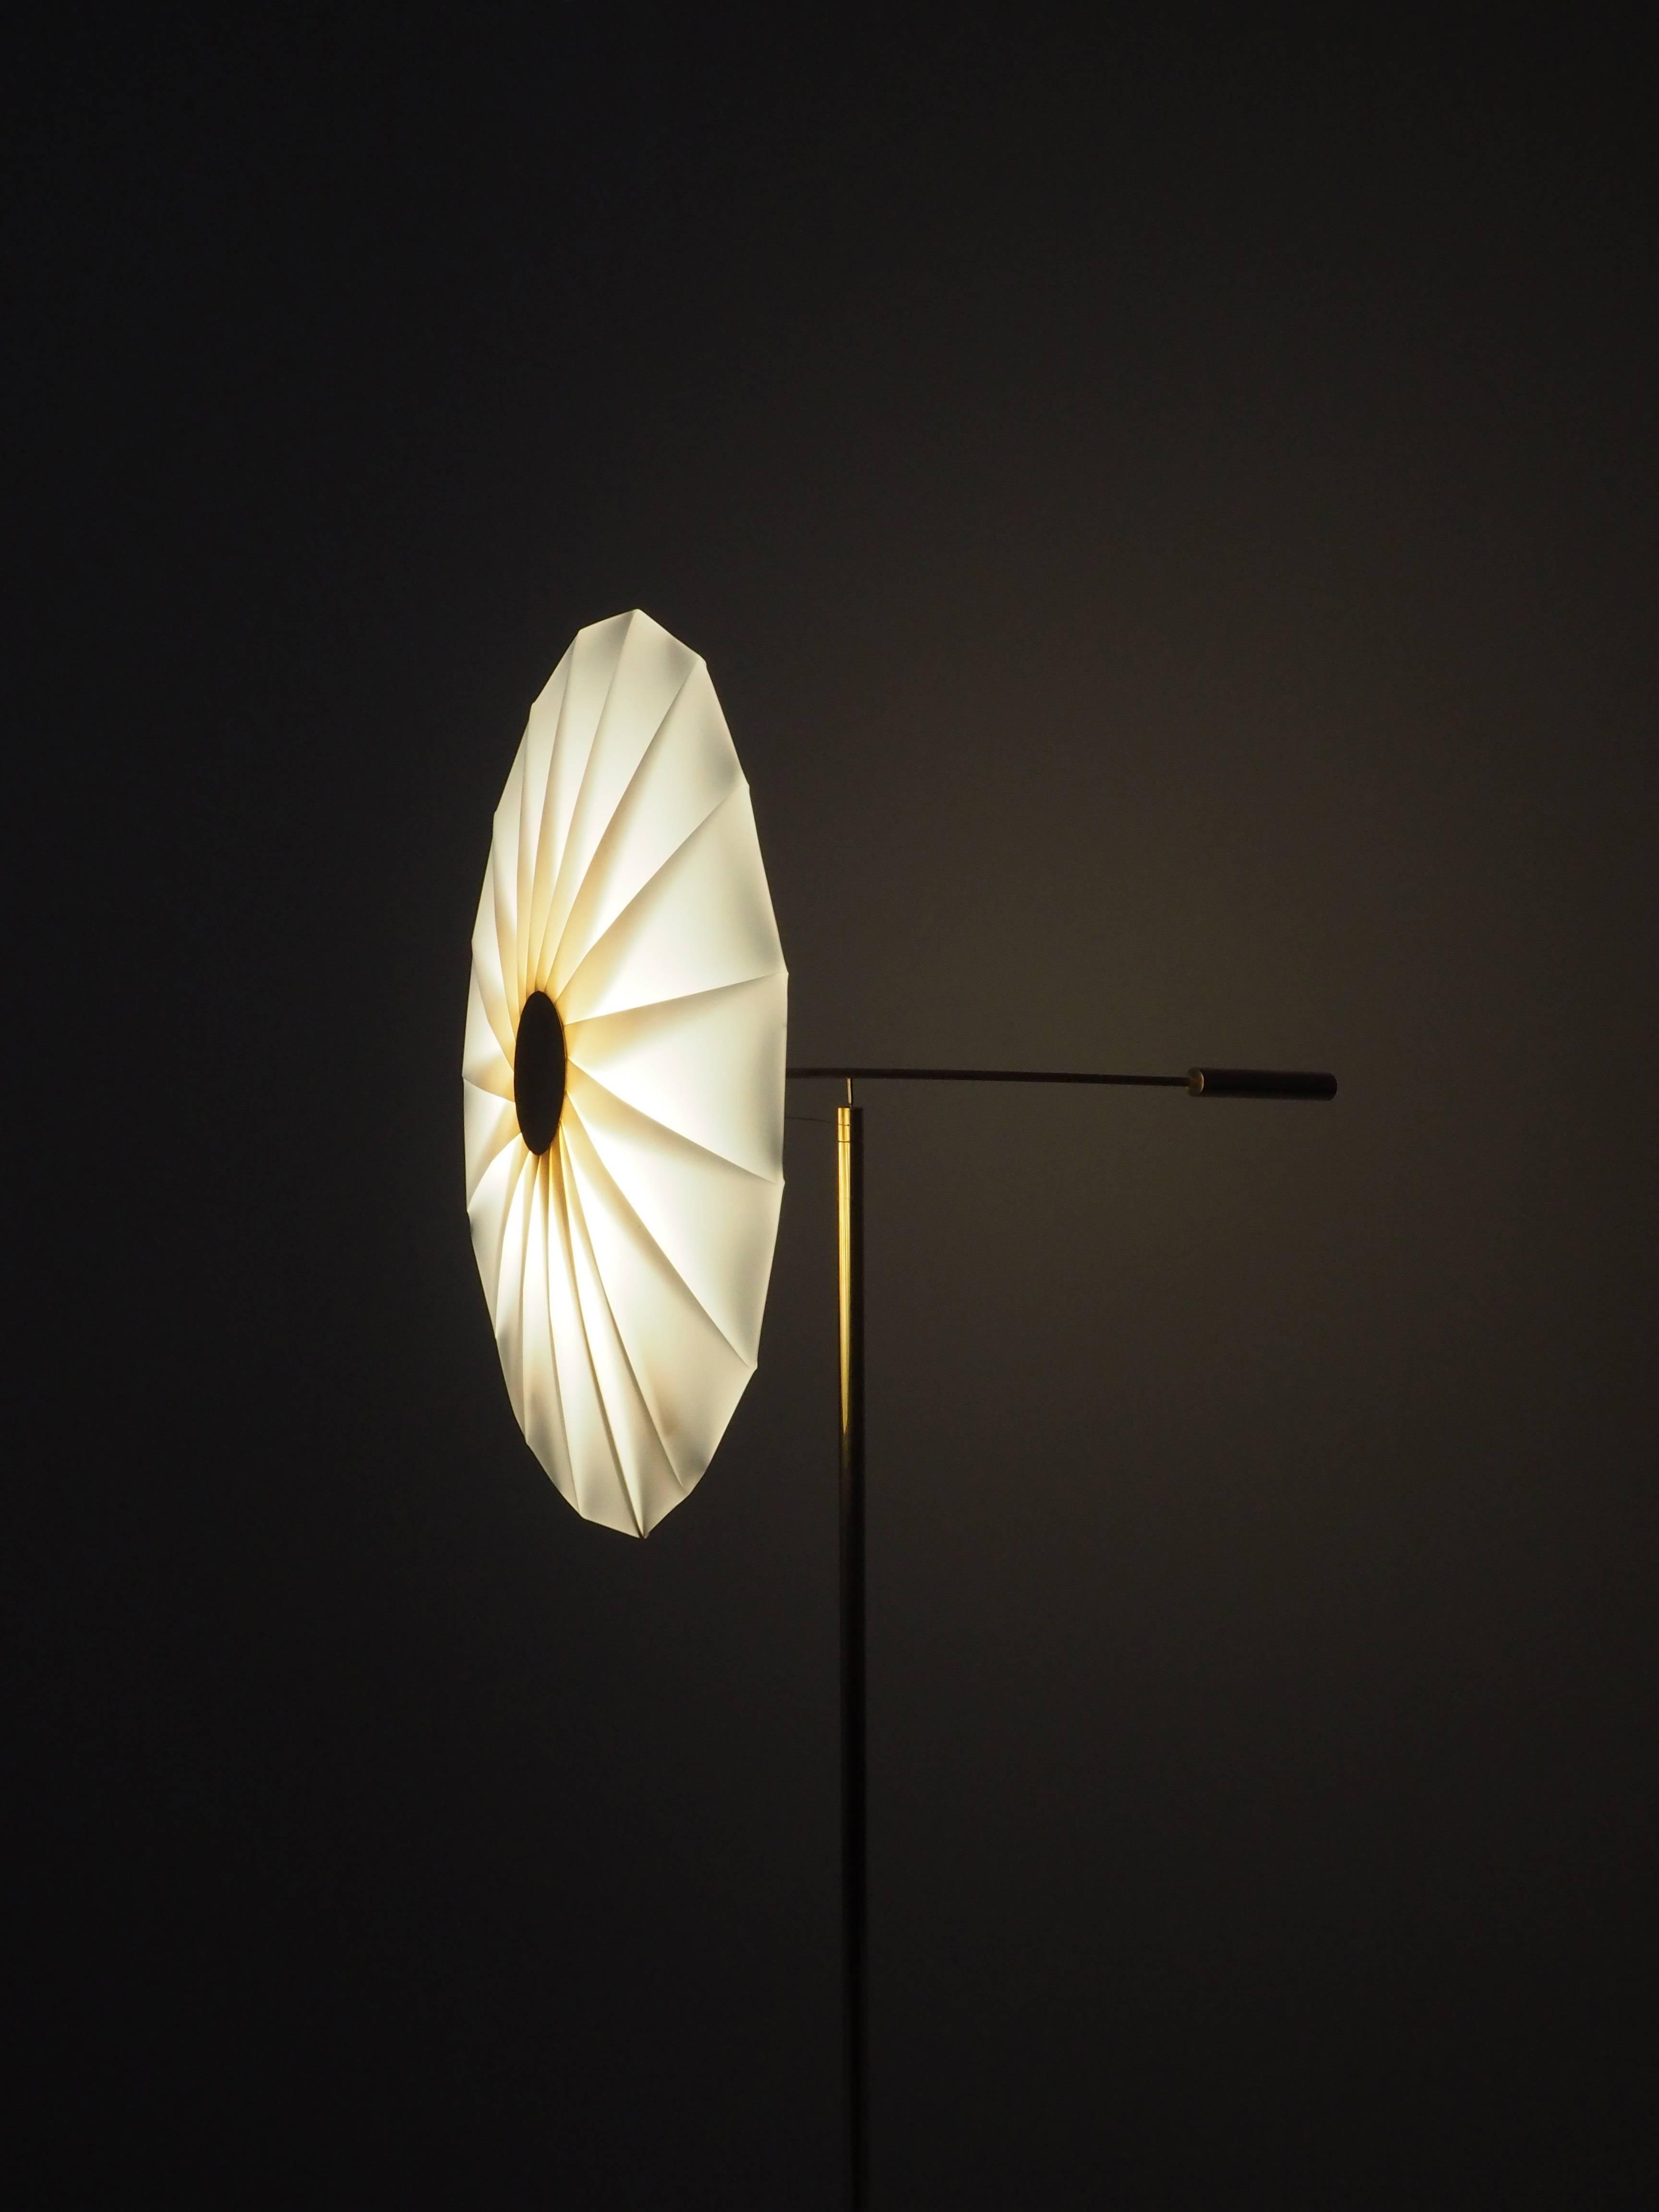 Brass Bloom, Floor Lamp, Umut Yamac For Sale at 1stdibs